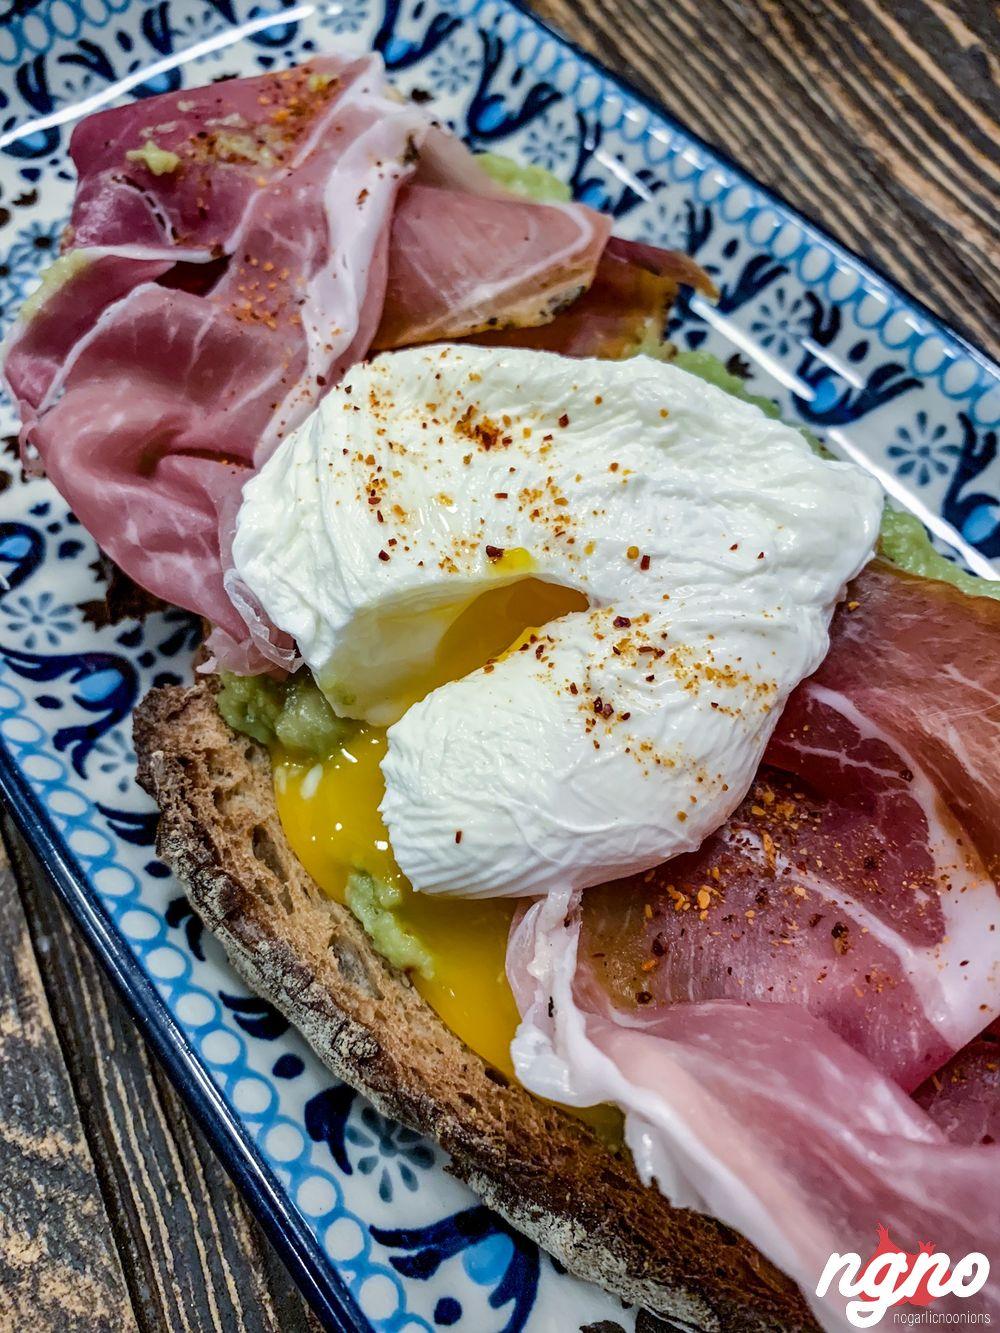 paris-breakfast2019-01-11-01-59-57